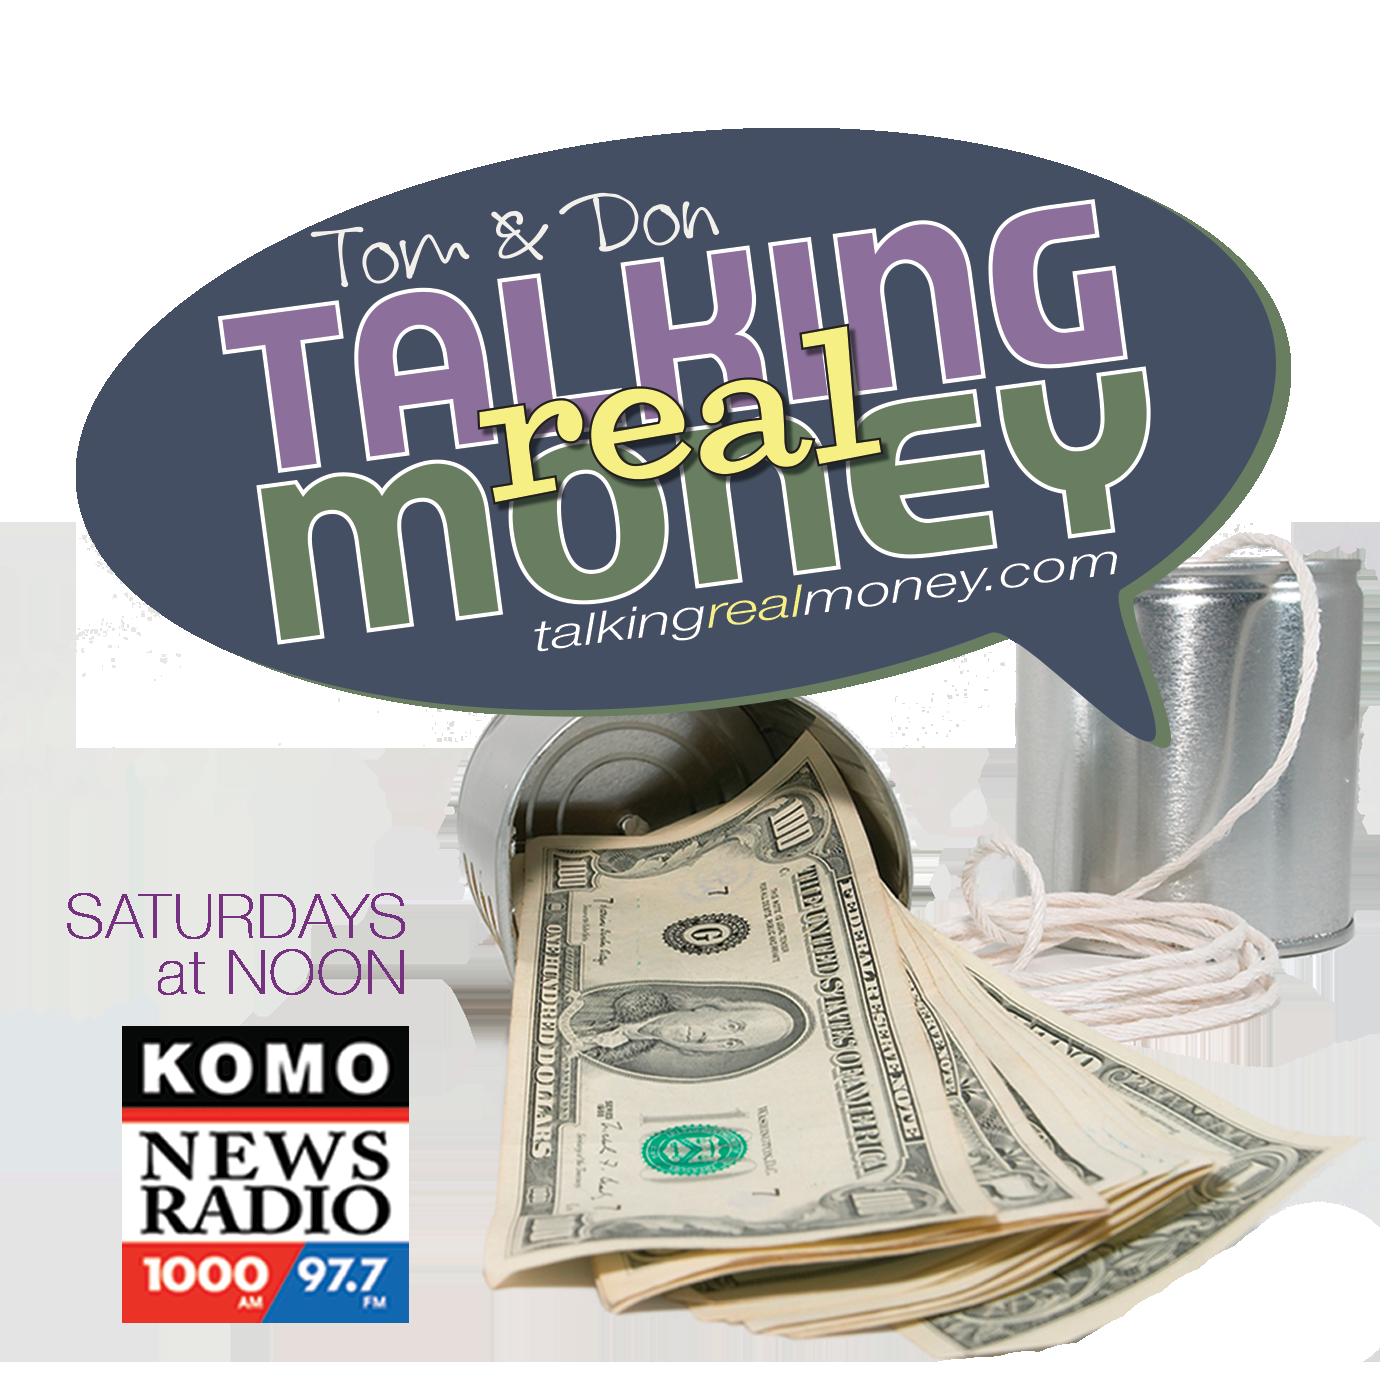 Talking-Real-Money-square-logo-trans.png